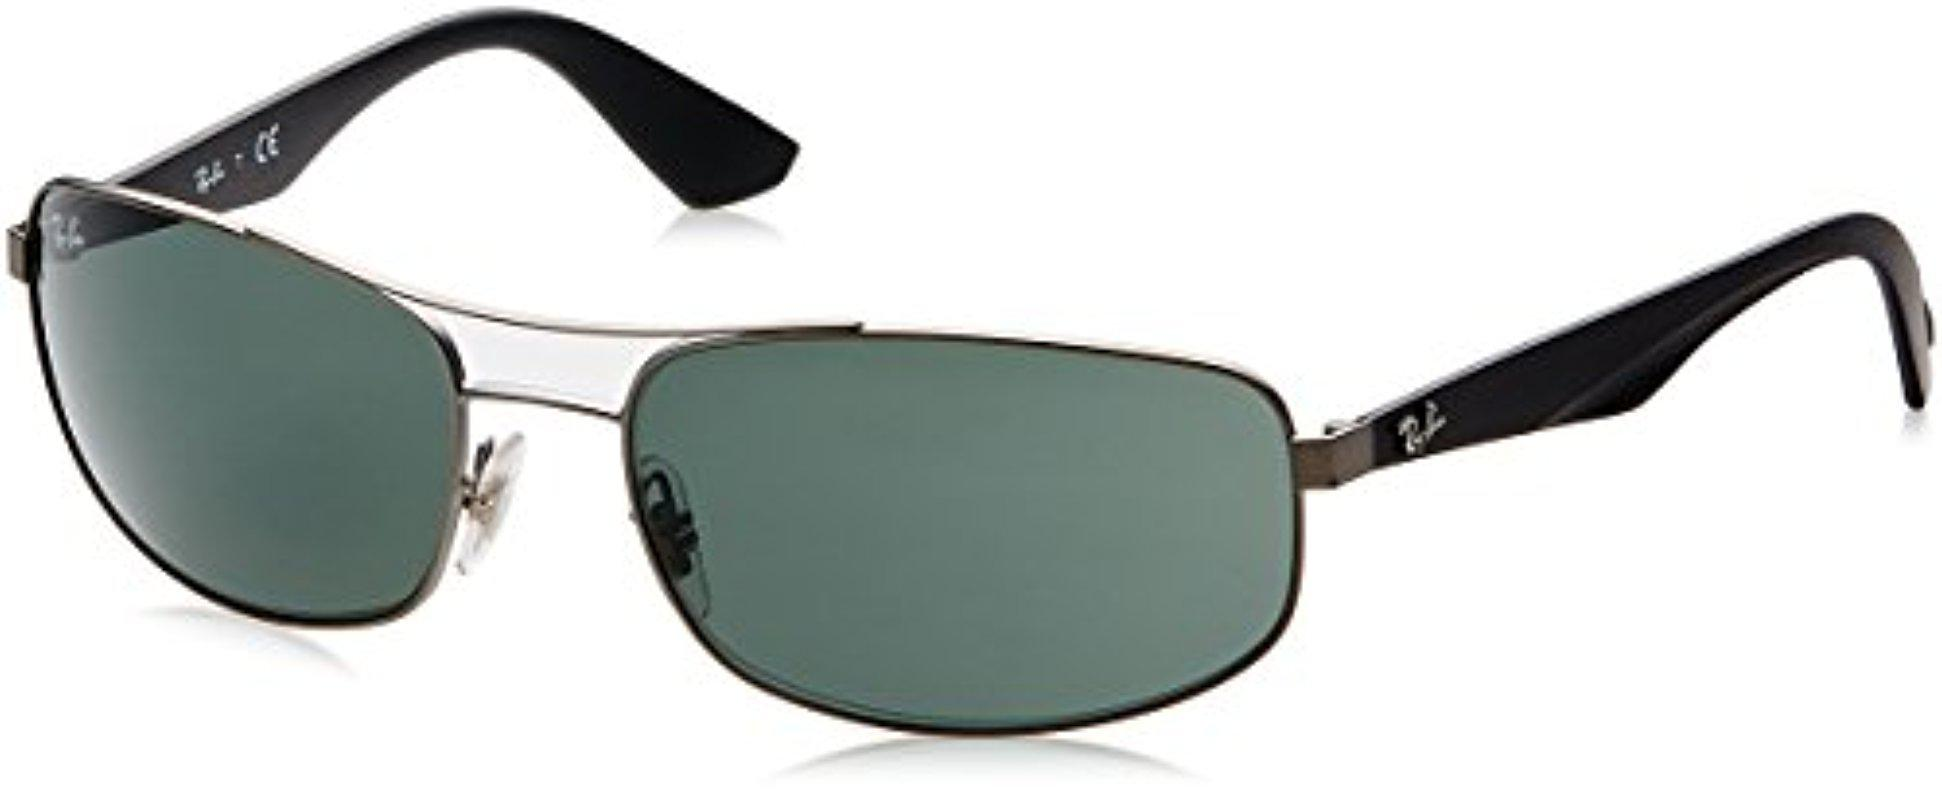 c708025b32 Lyst - Ray-Ban Metal Man Sunglass - Matte Gunmetal Frame Gray Green ...